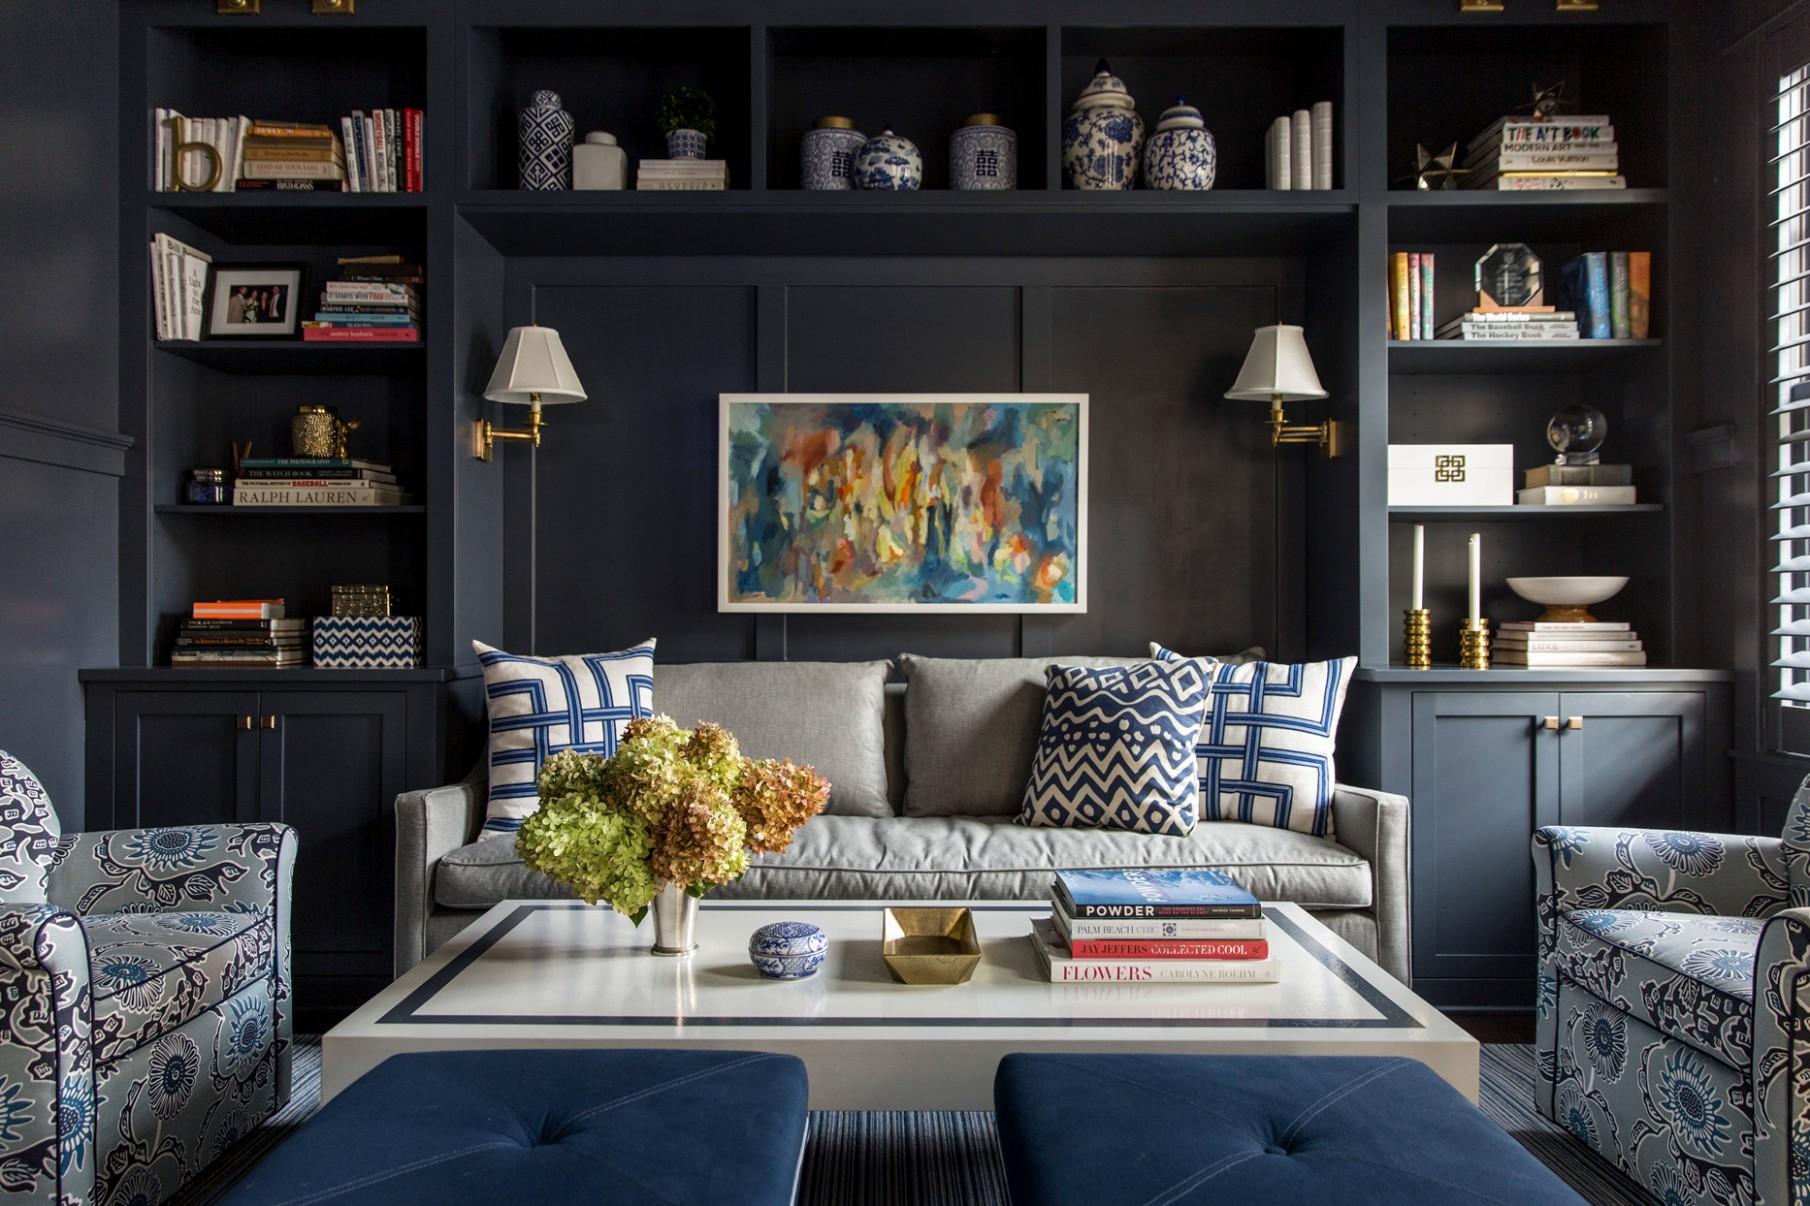 Our Favorite Bookshelf Organizing Ideas  Martha Stewart - Home Office Bookshelf Ideas